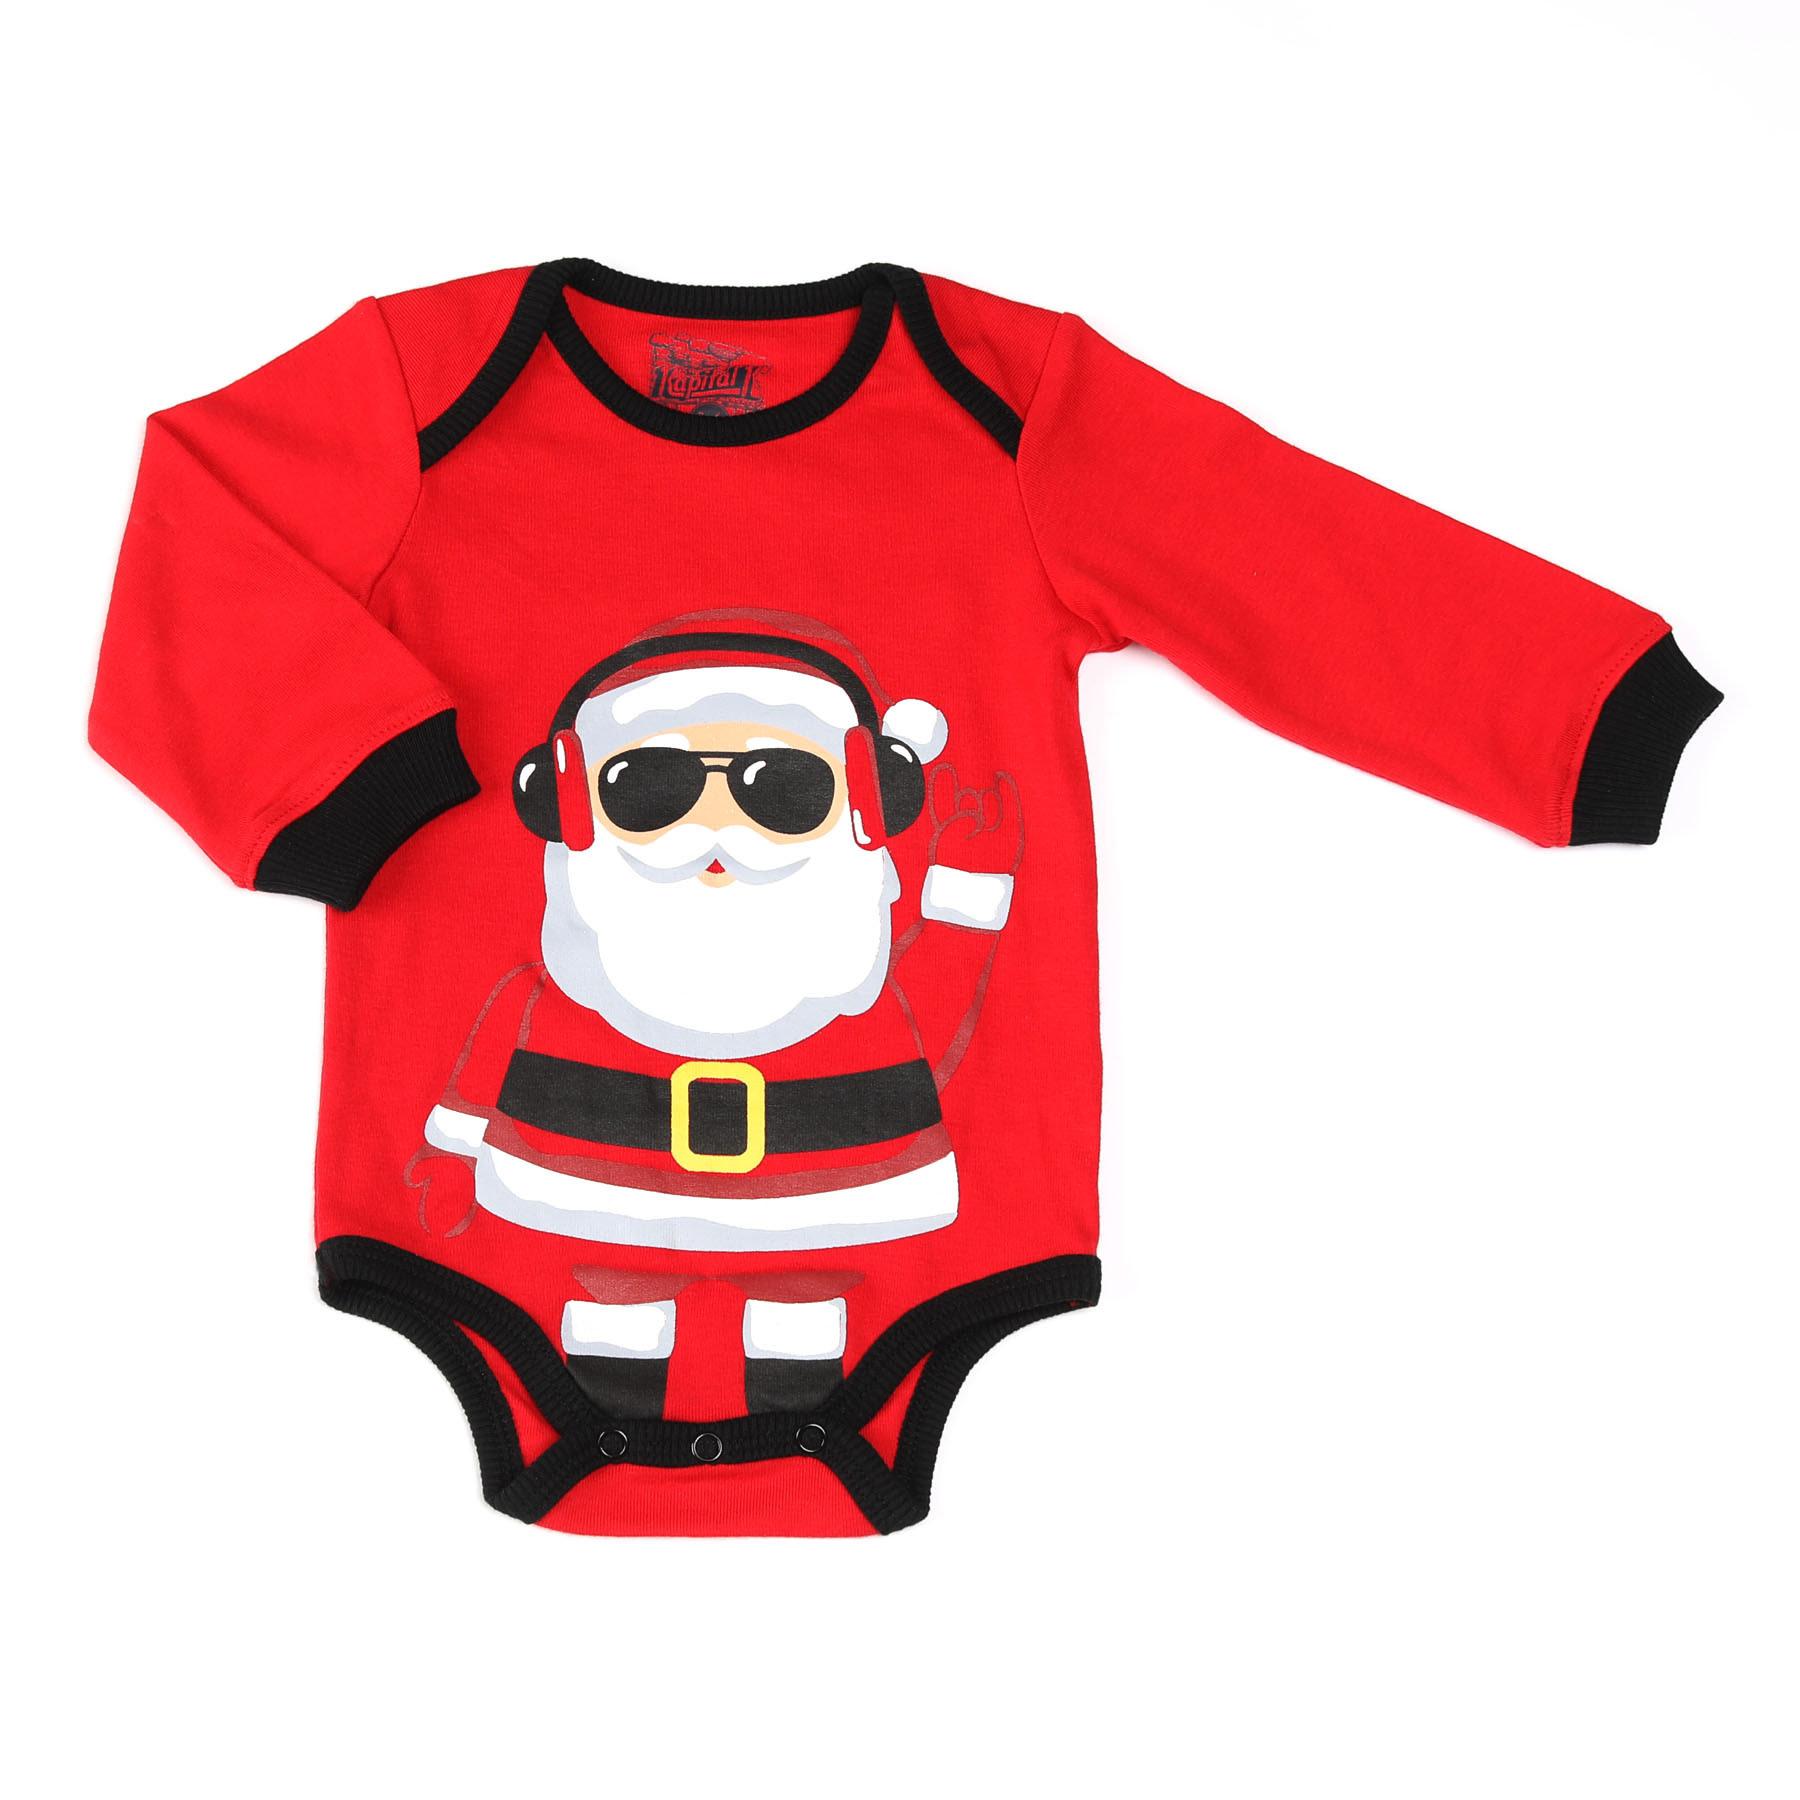 Kapital K Baby Santa Claus Bodysuit